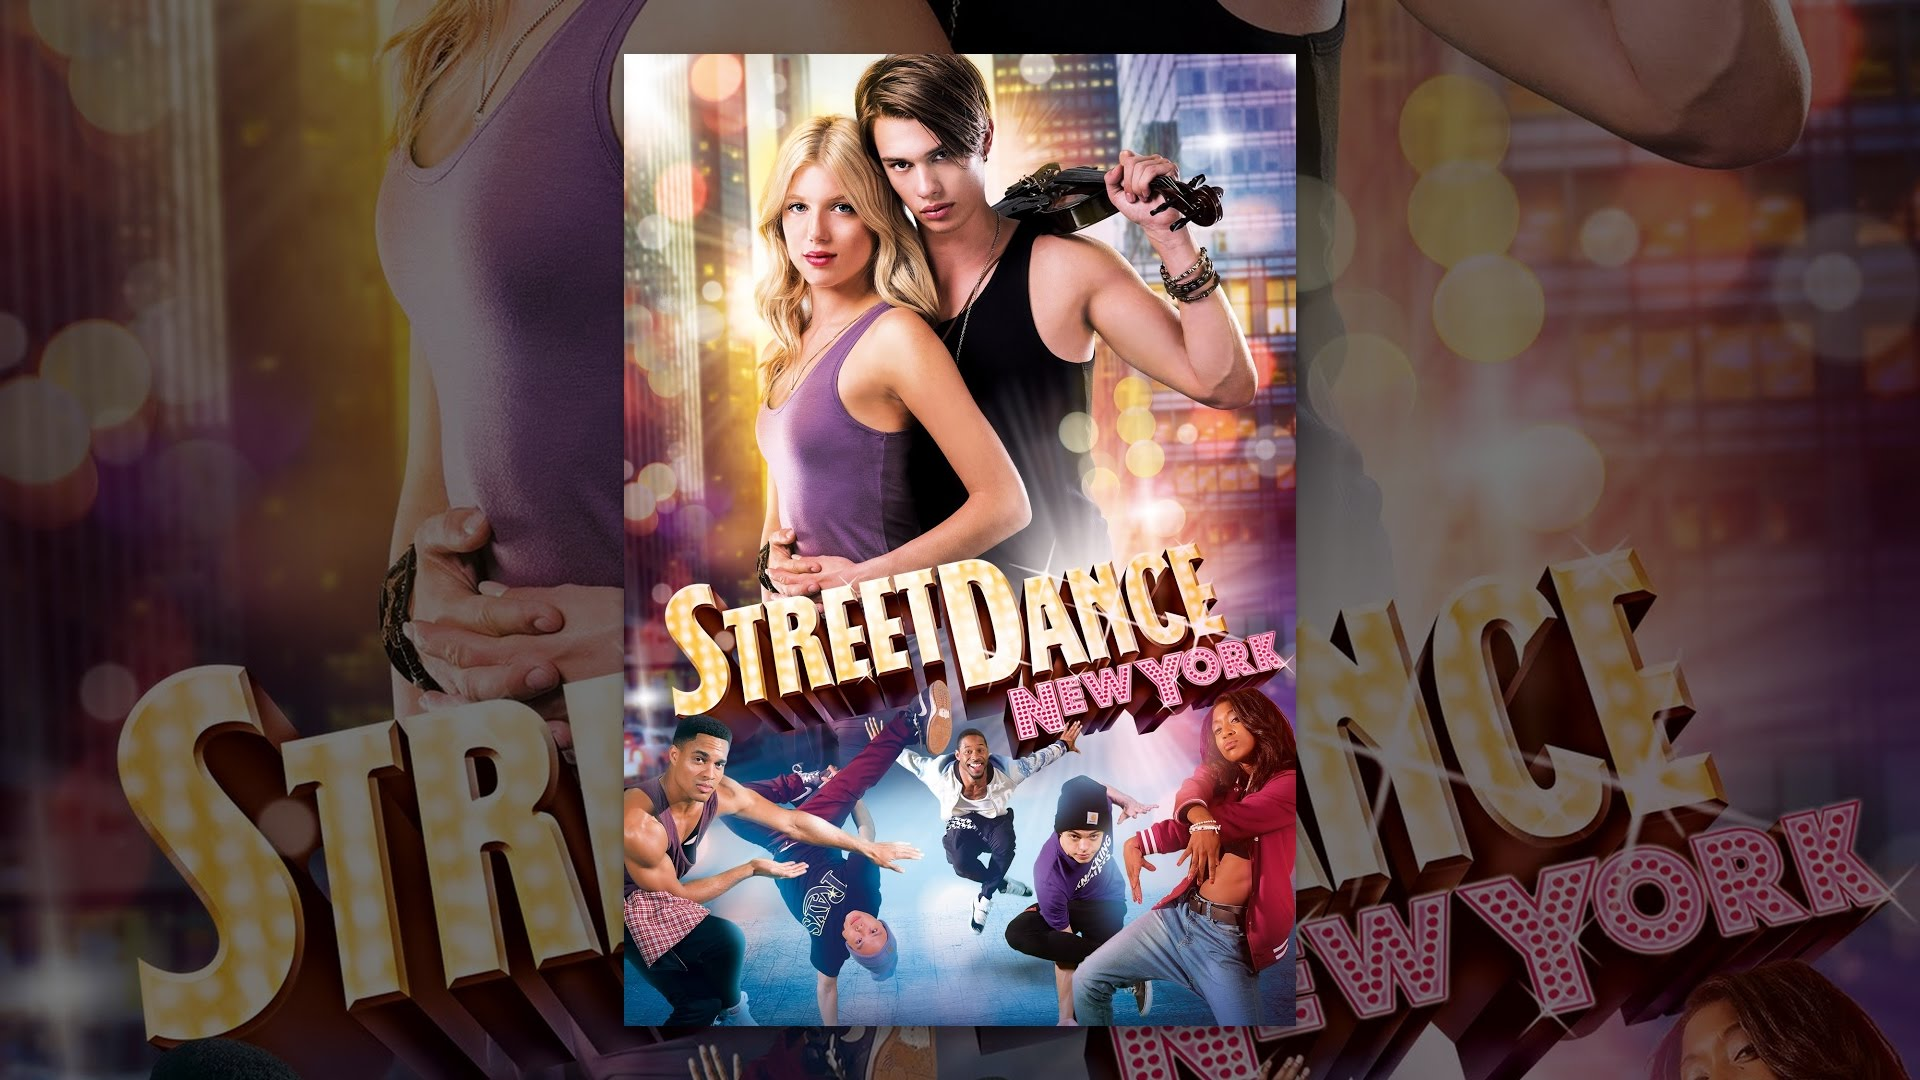 Streetdance New York Movie4k